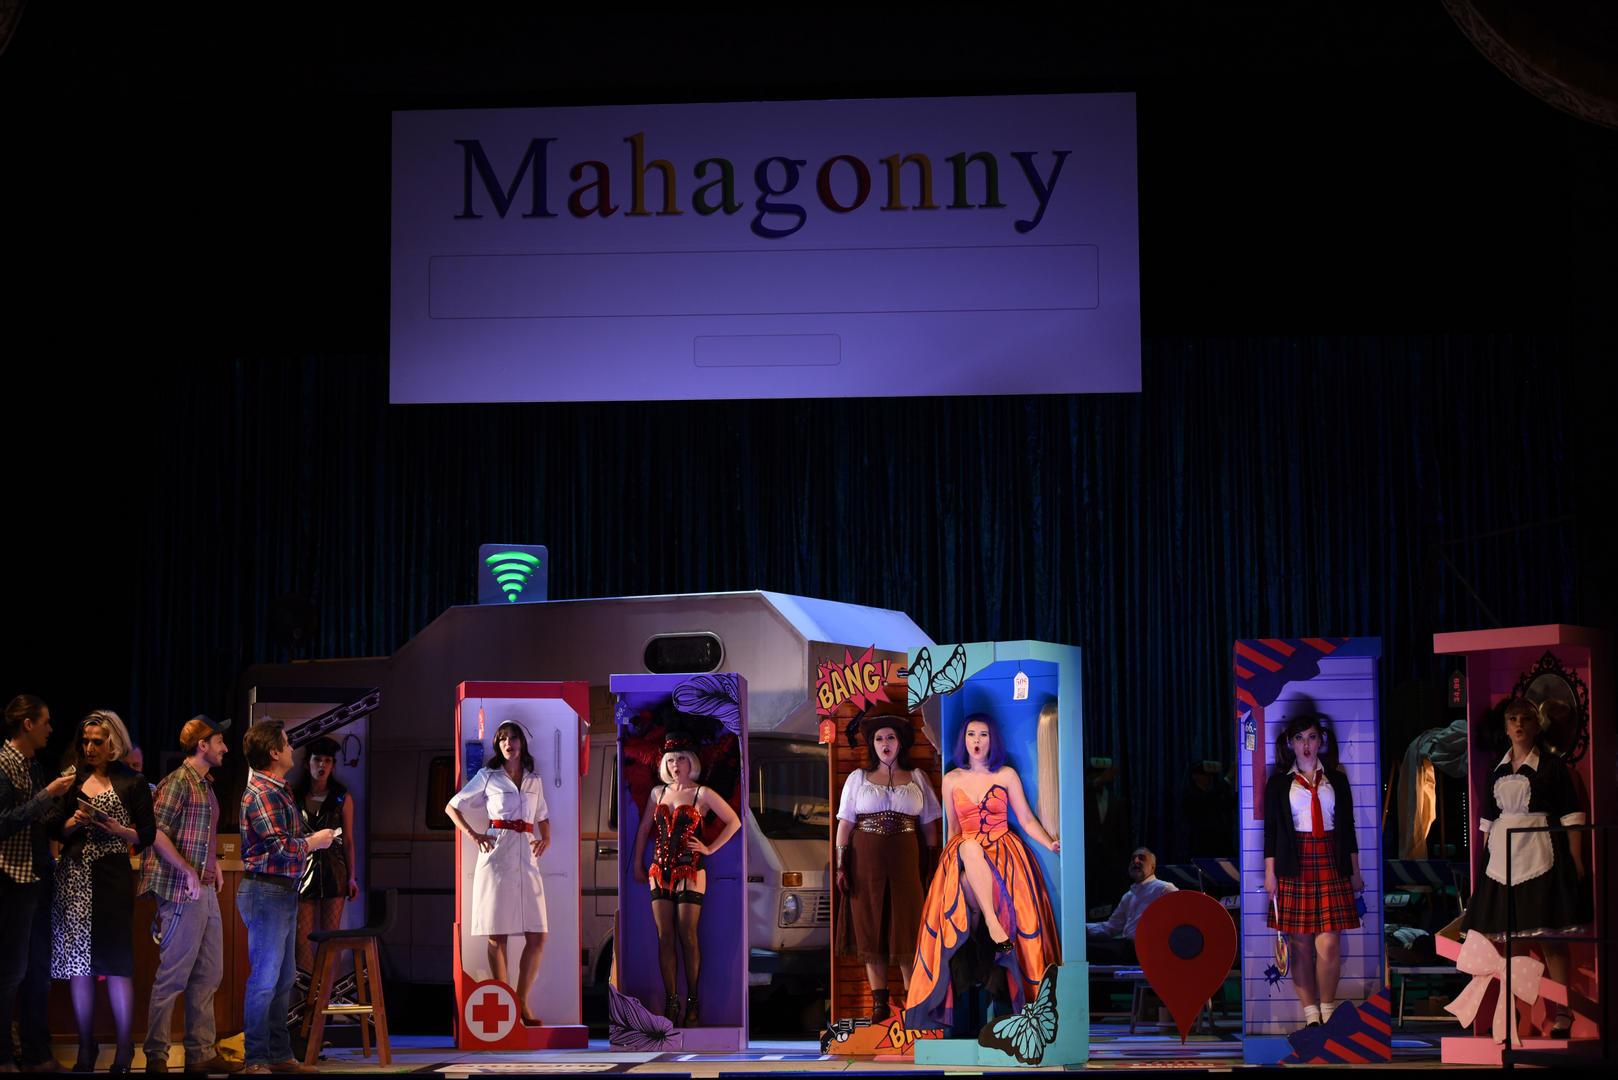 Mahagonny-Opera-by-Kurt-Weill-Stage-director-Jacopo-Spirei-Salzburg-7